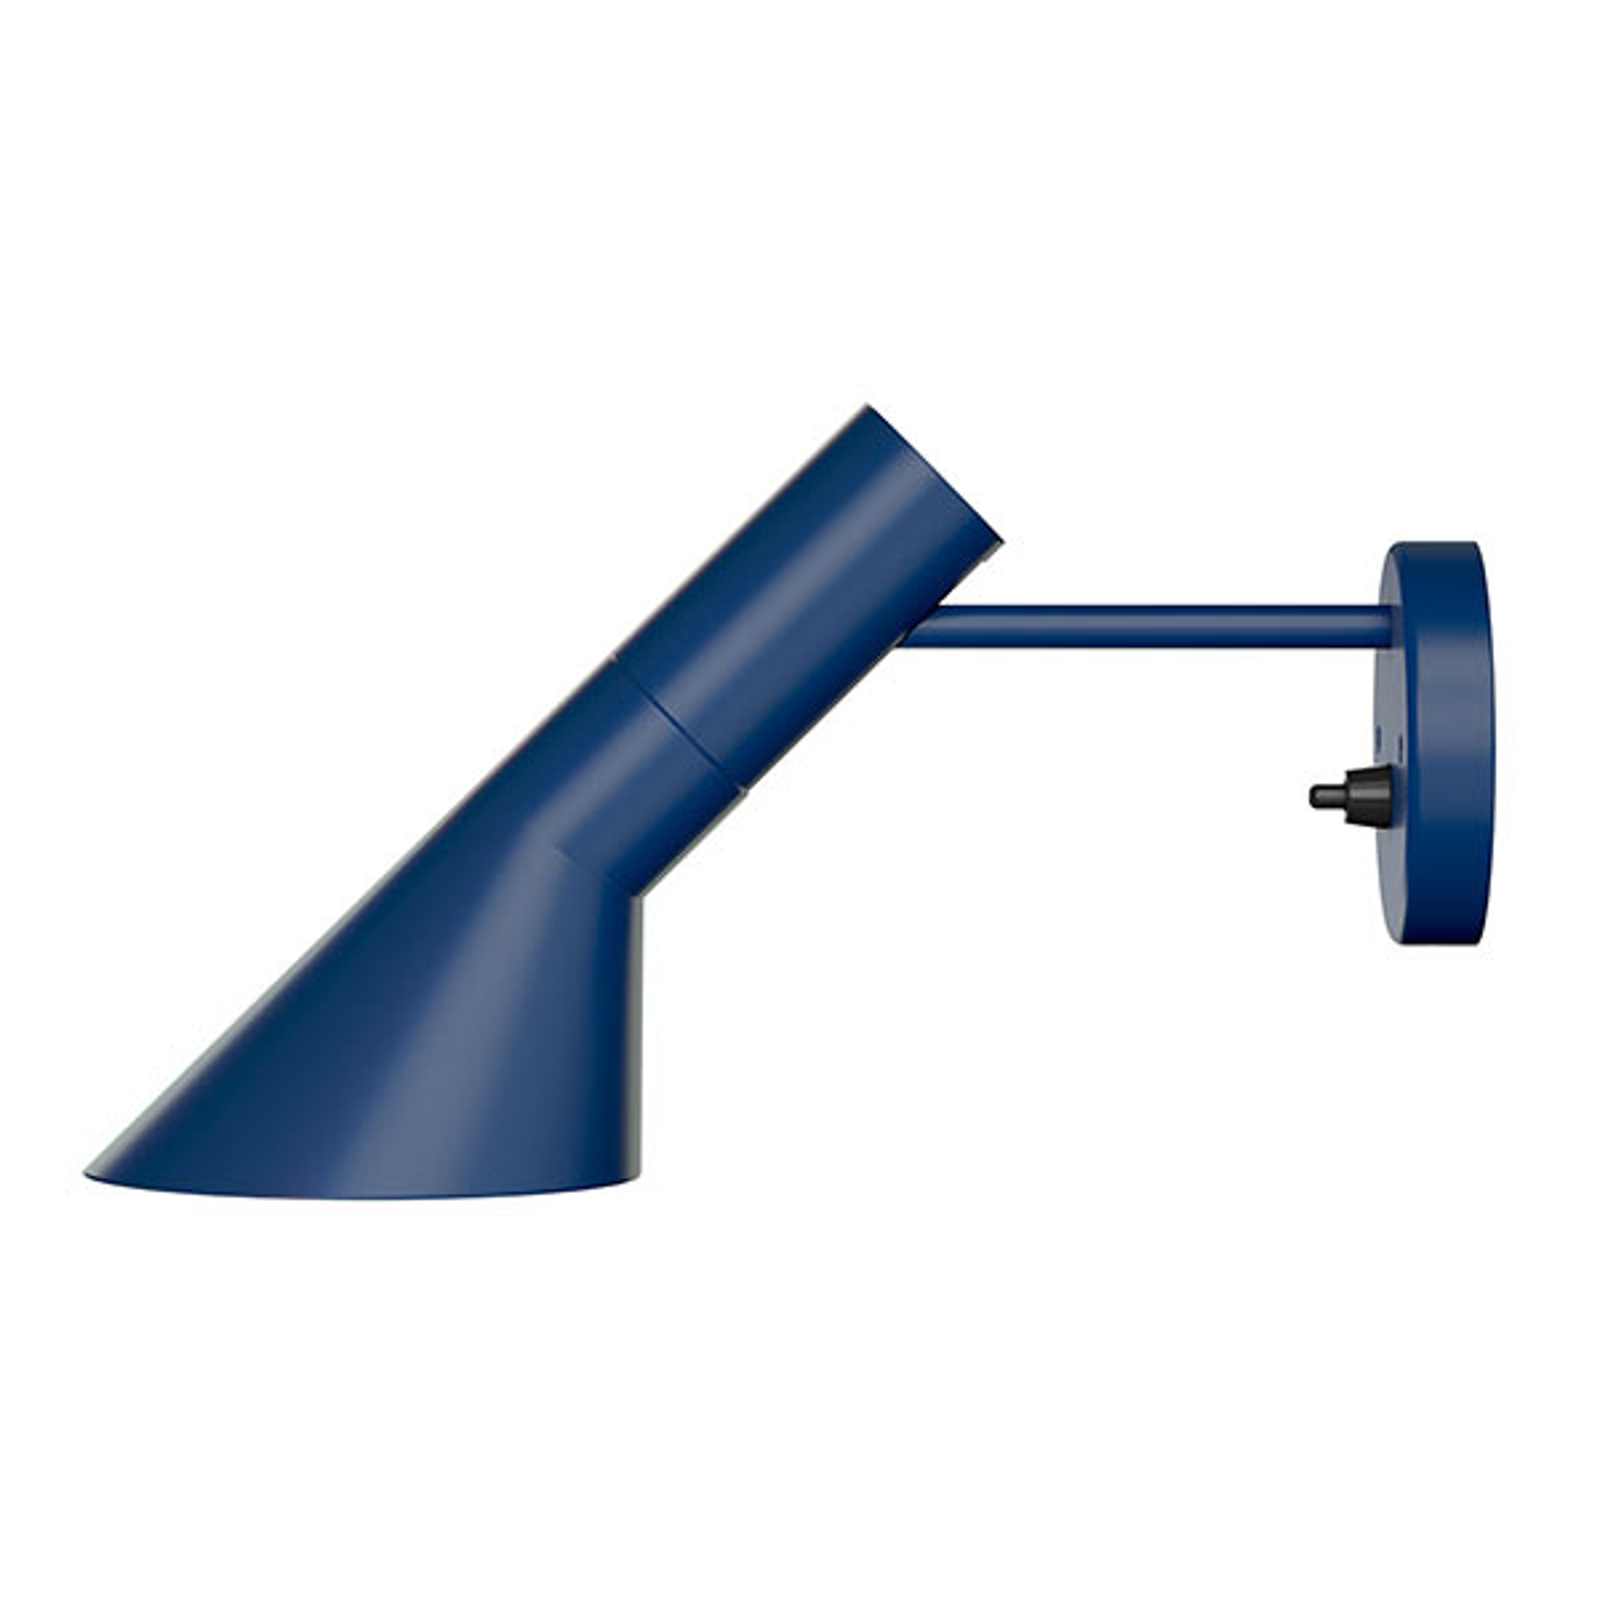 Louis Poulsen AJ - wandlamp, middernachtblauw